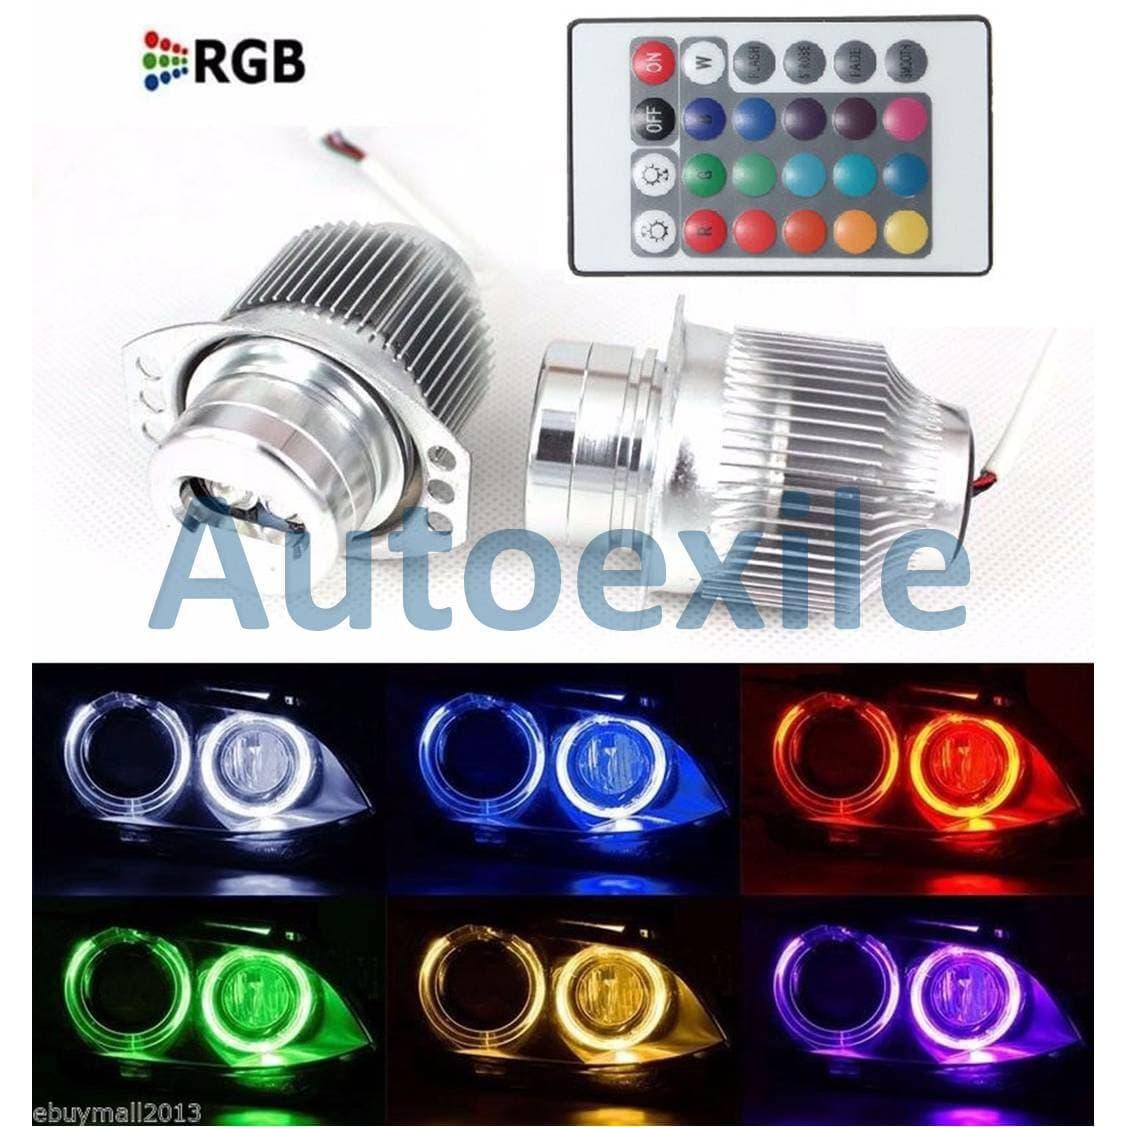 Angel Eyes LED RGB Putih Lampu Bimmer Warna Warni Mobil BMW E90 E91 2005 - 08, 3 Series LCI 2009 Remote